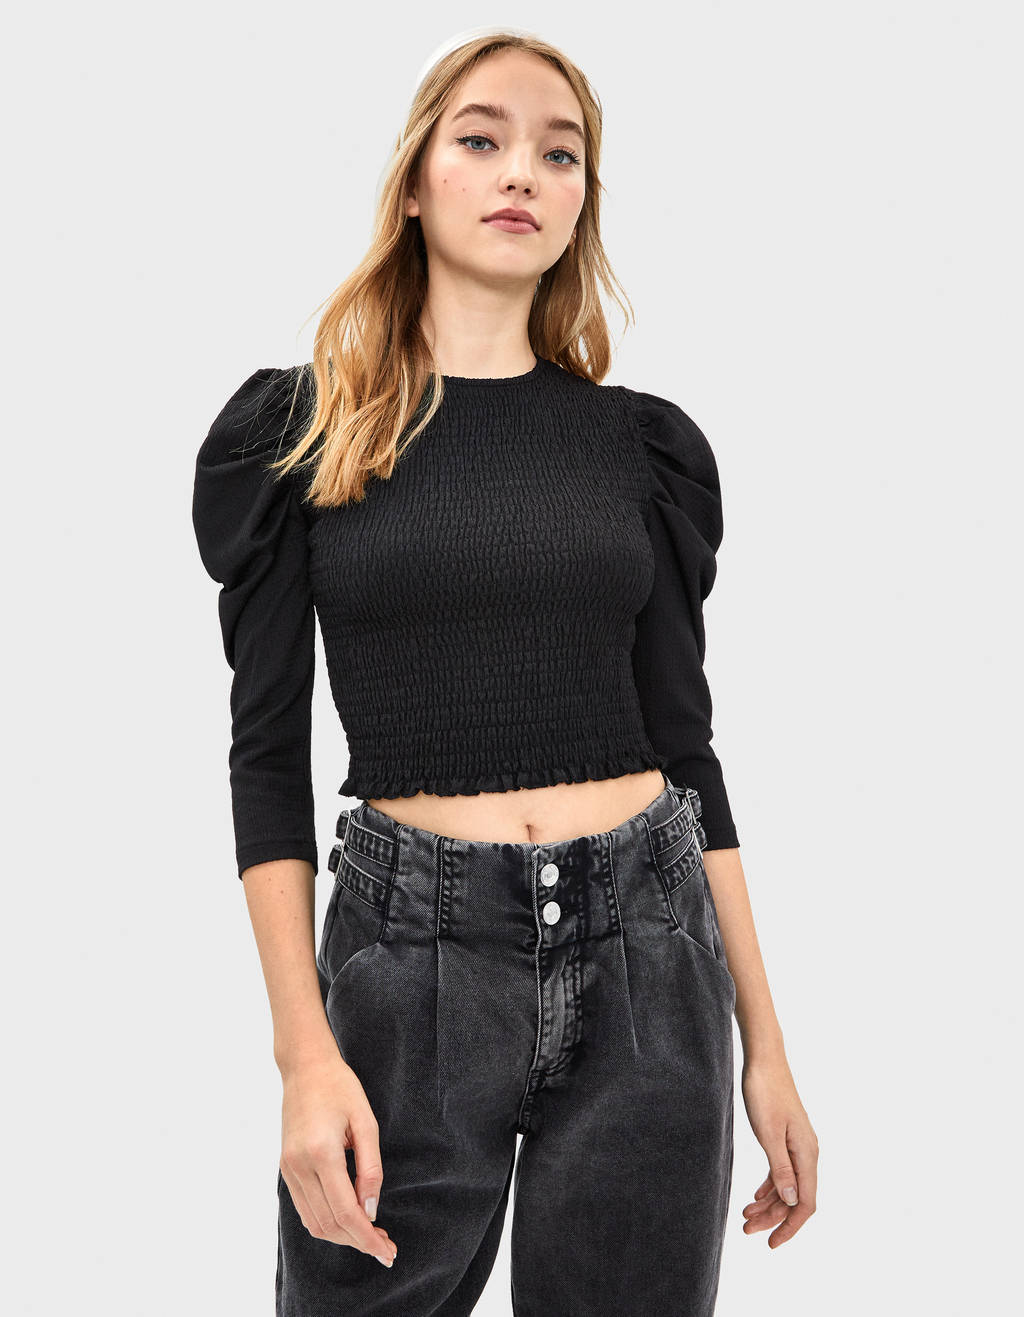 Voluminous blouse with shirred elastic